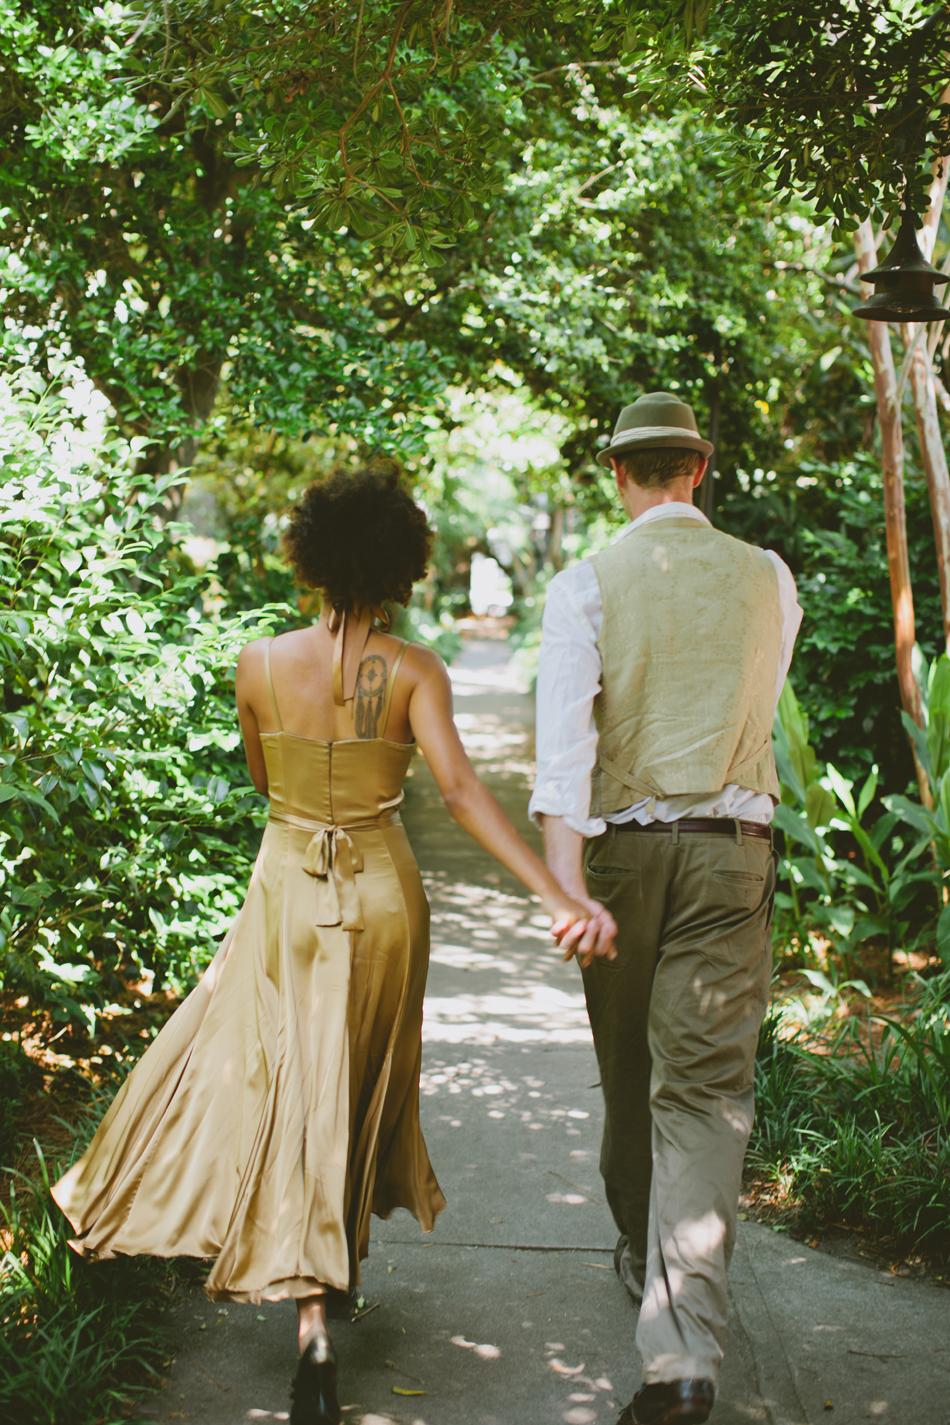 Jameykay_arlie_bohemian_elopement_styled_shoot015.jpg